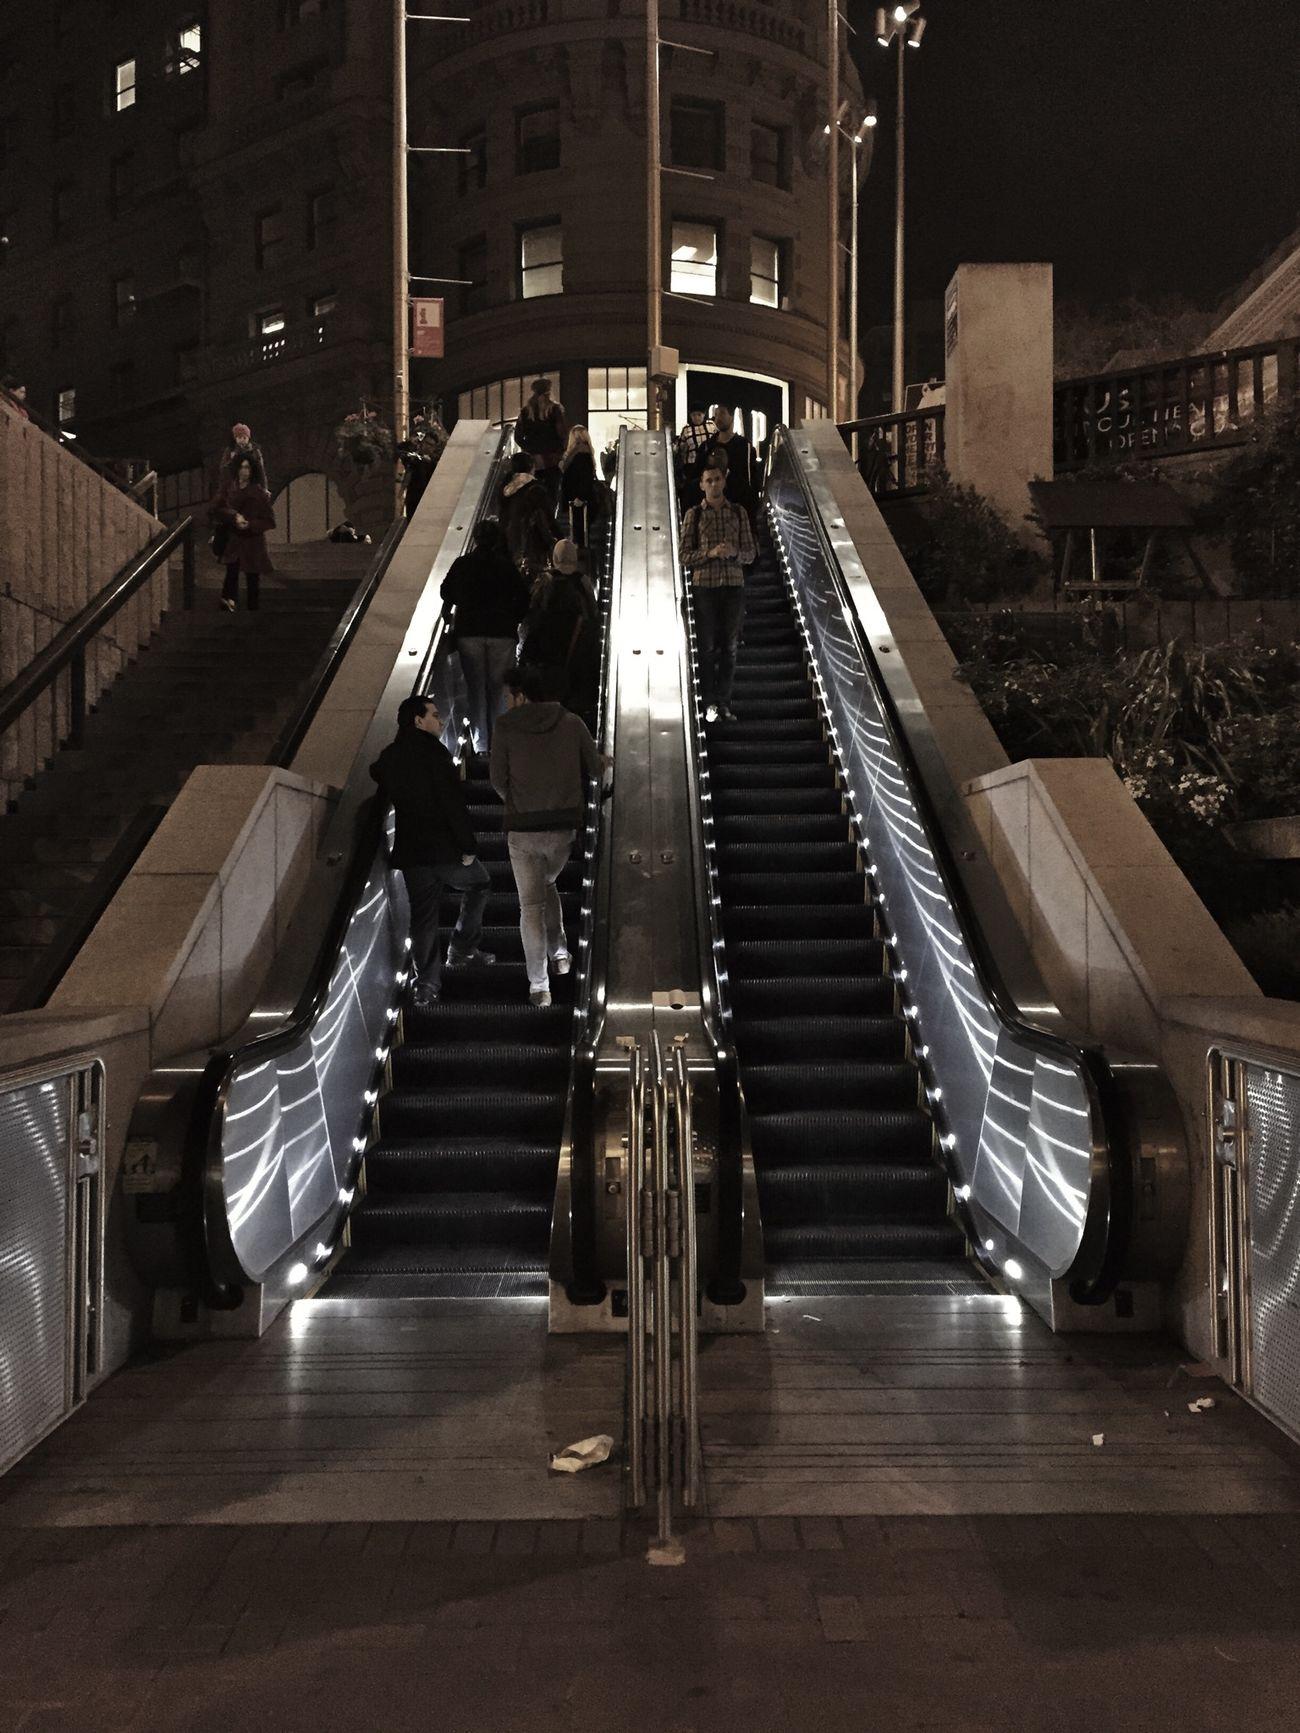 Escalator Perspective Lookingup